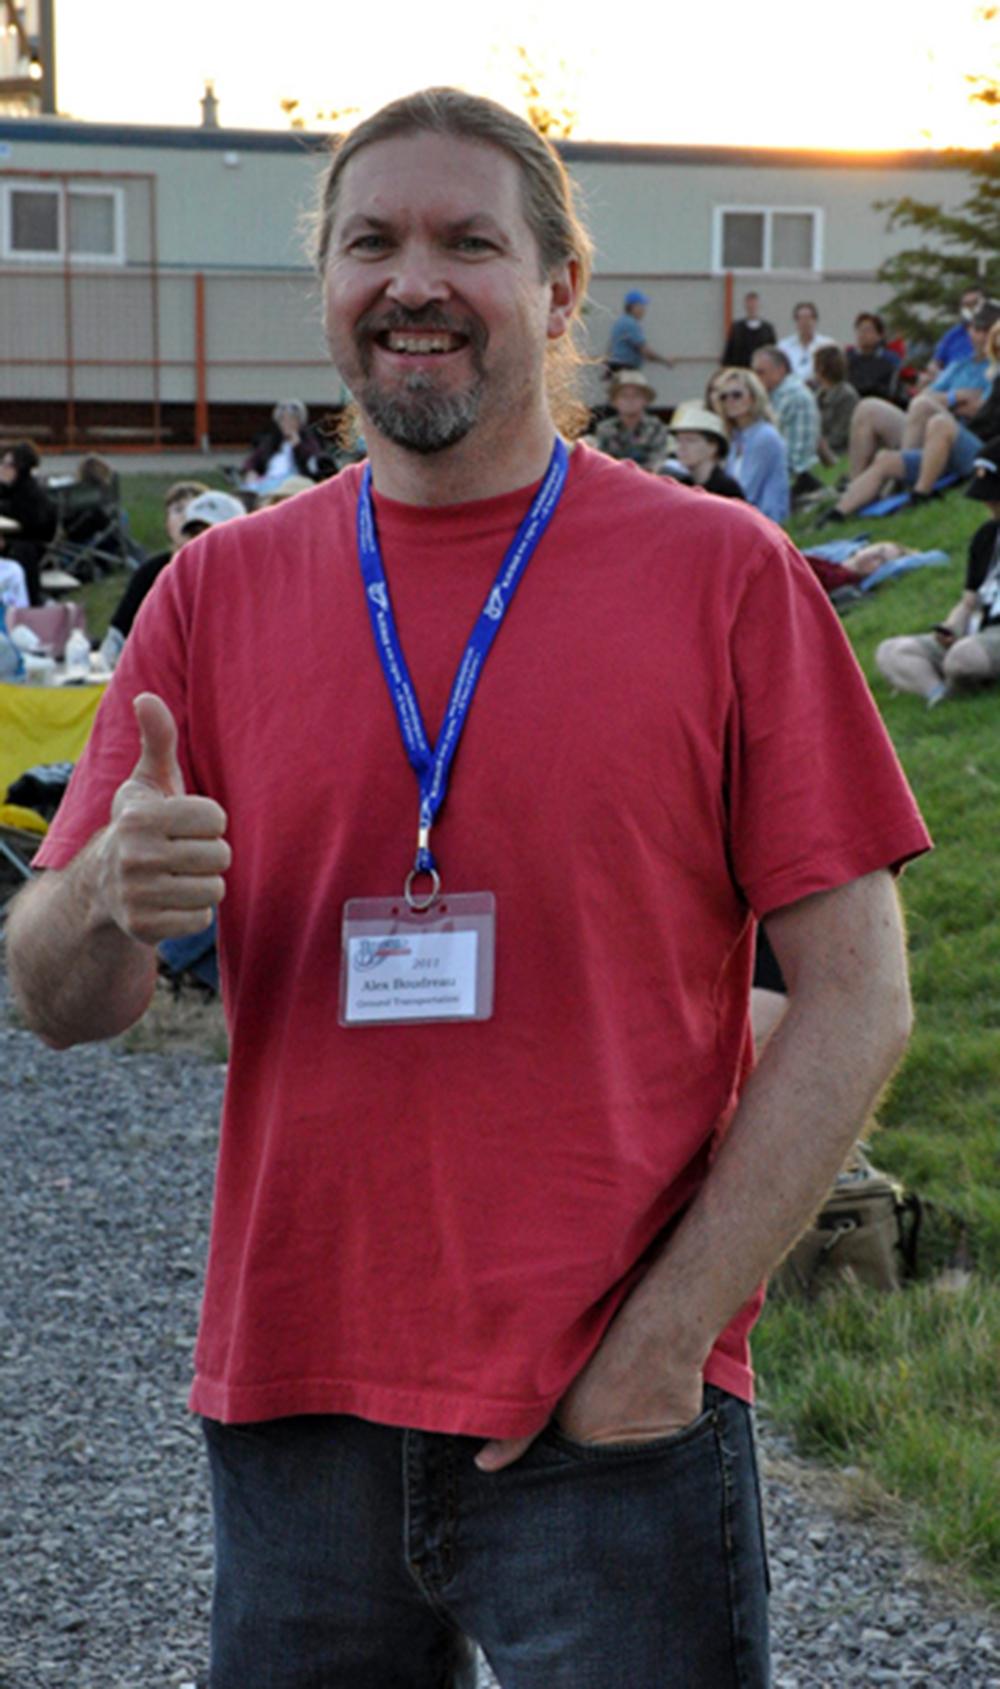 2011 - Volunteer Driver Alex Boudreau